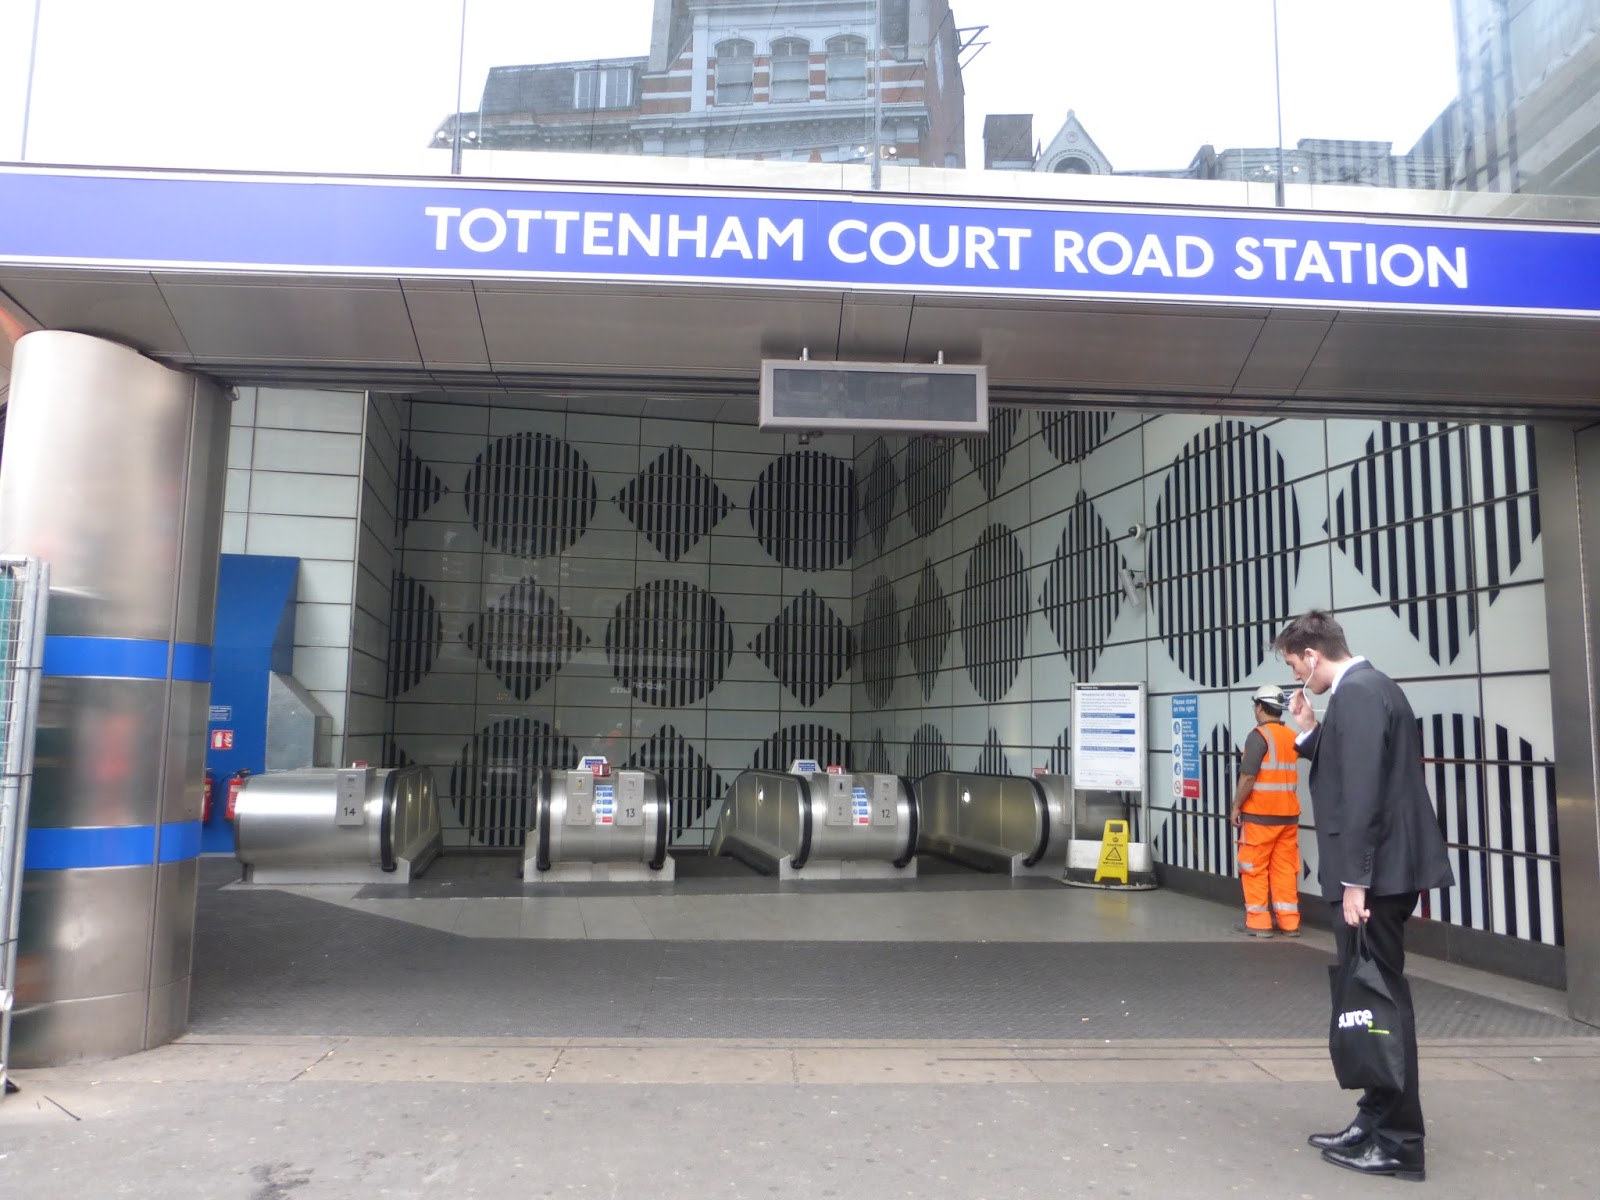 62andthenext10pathways Tottenham Court Road